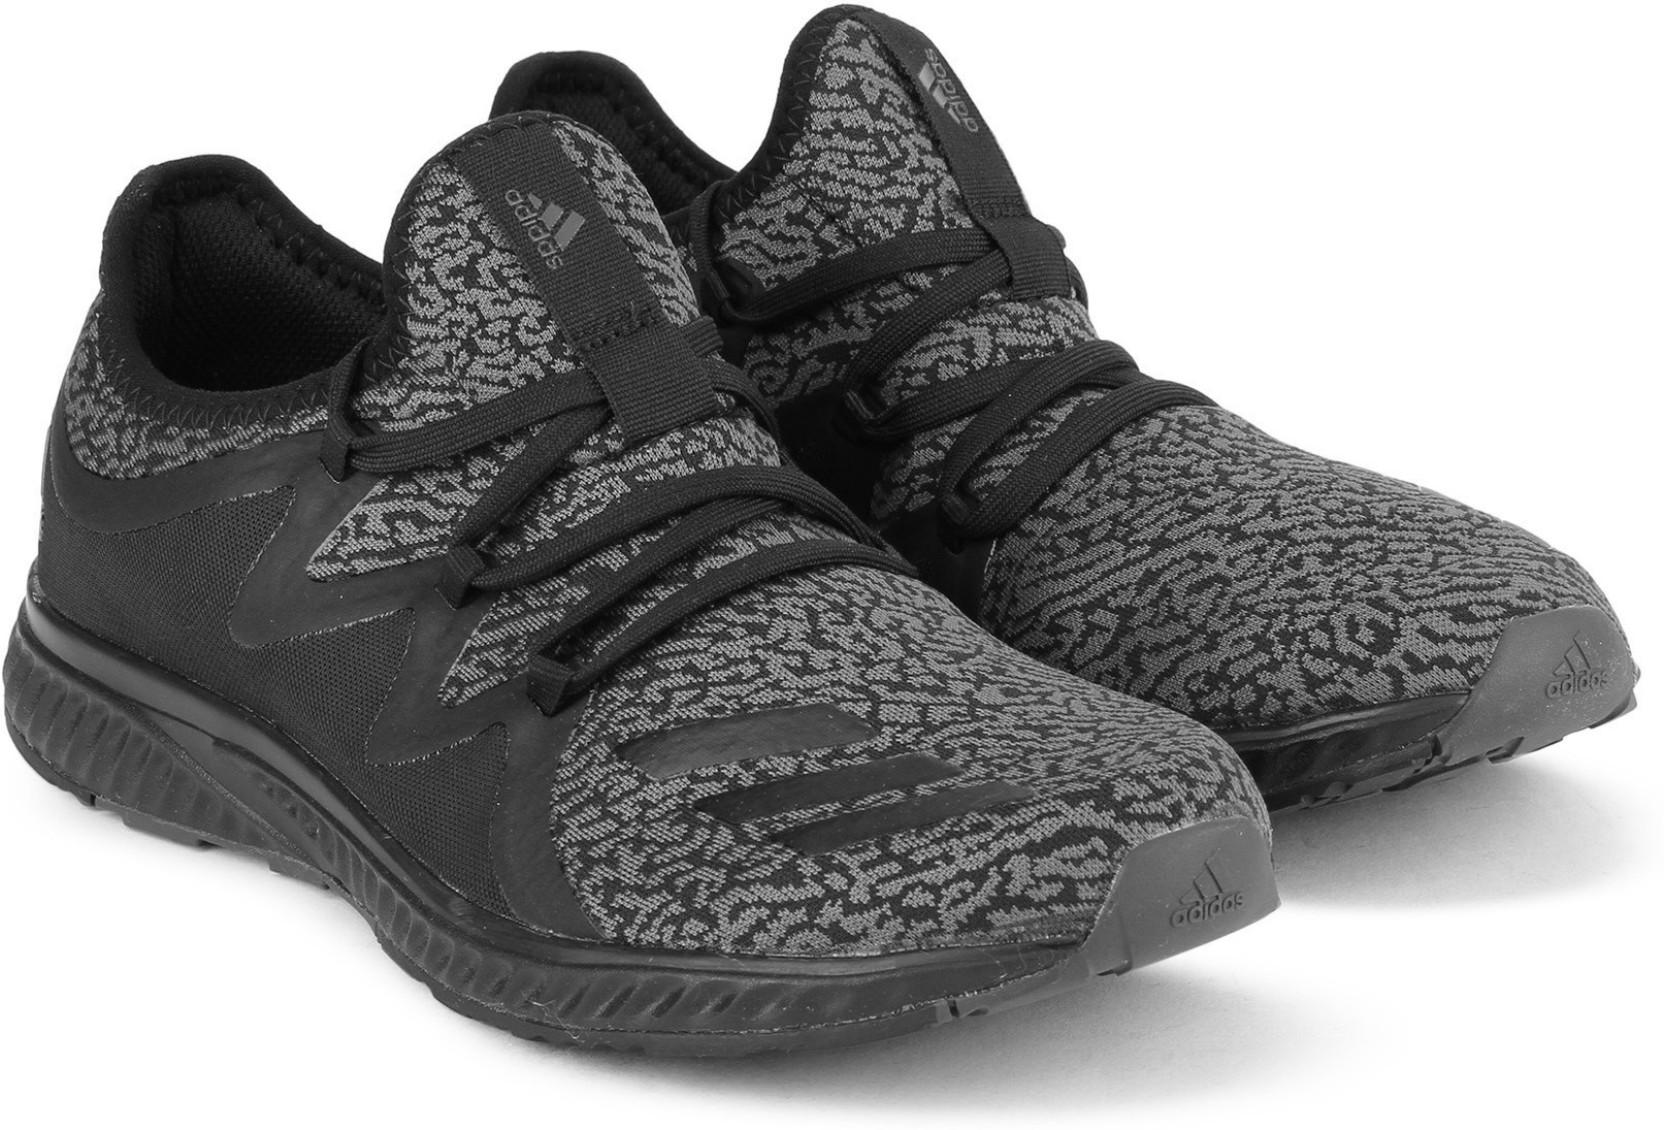 59e92ad084cd ADIDAS MANAZERO W Running Shoes For Women - Buy UTIBLK/CBLACK/FTWWHT ...